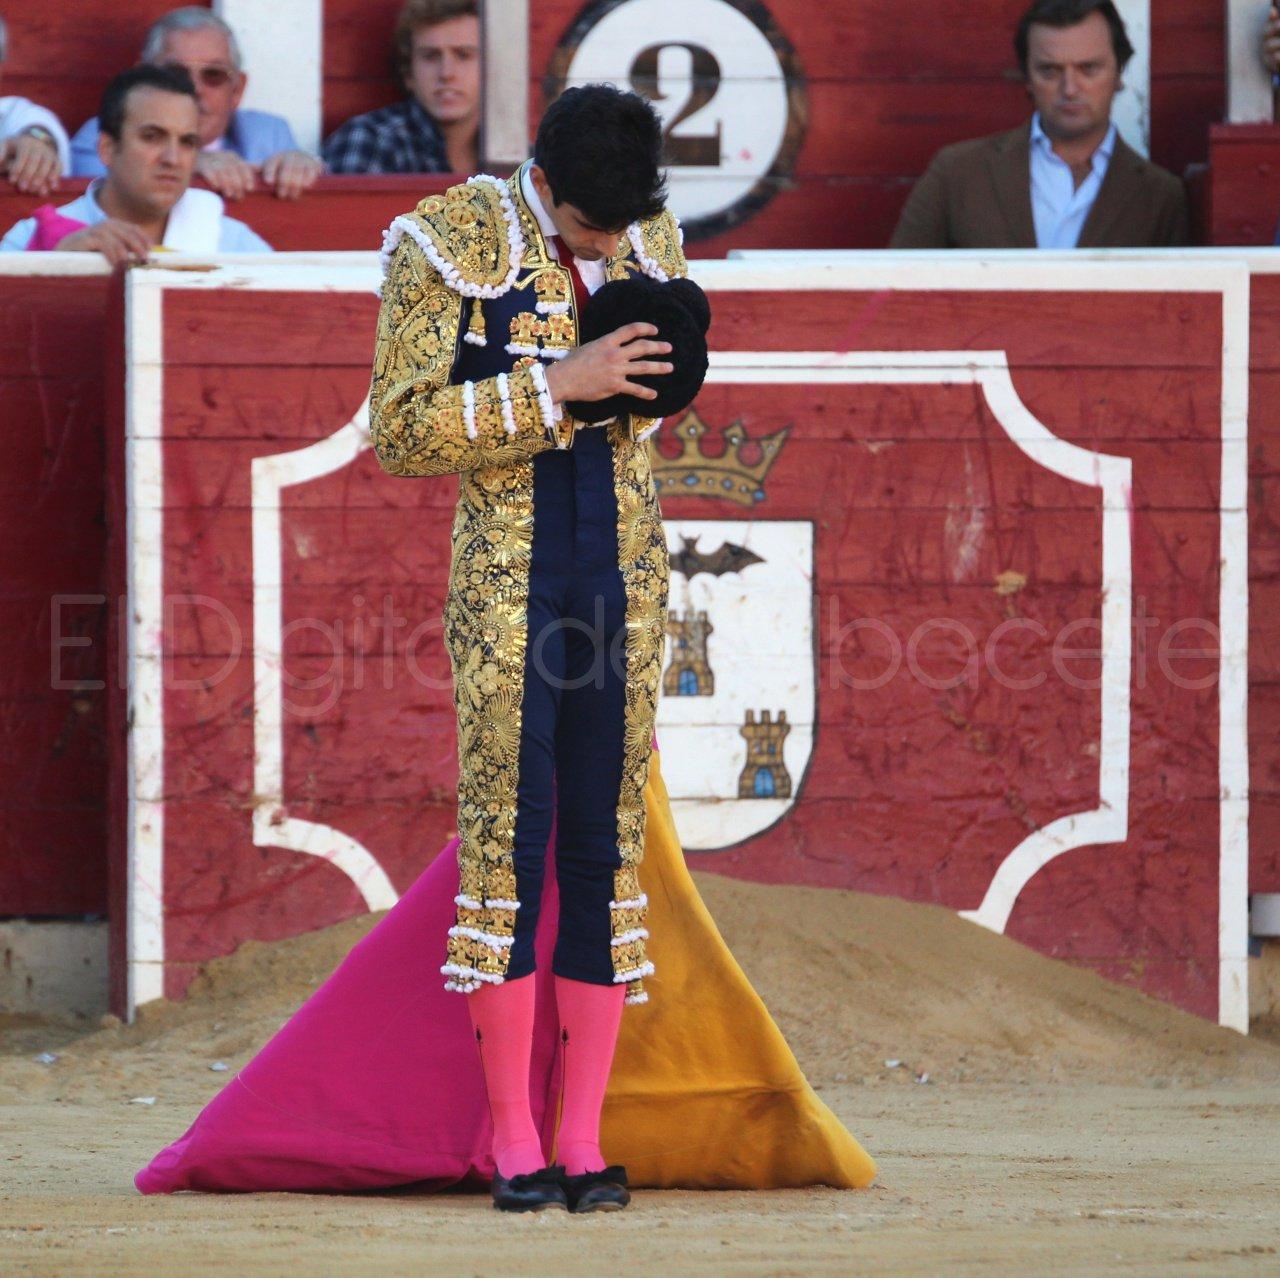 El Juli Lopez Simon y Garrido Feria Albacete 2015 toros  26